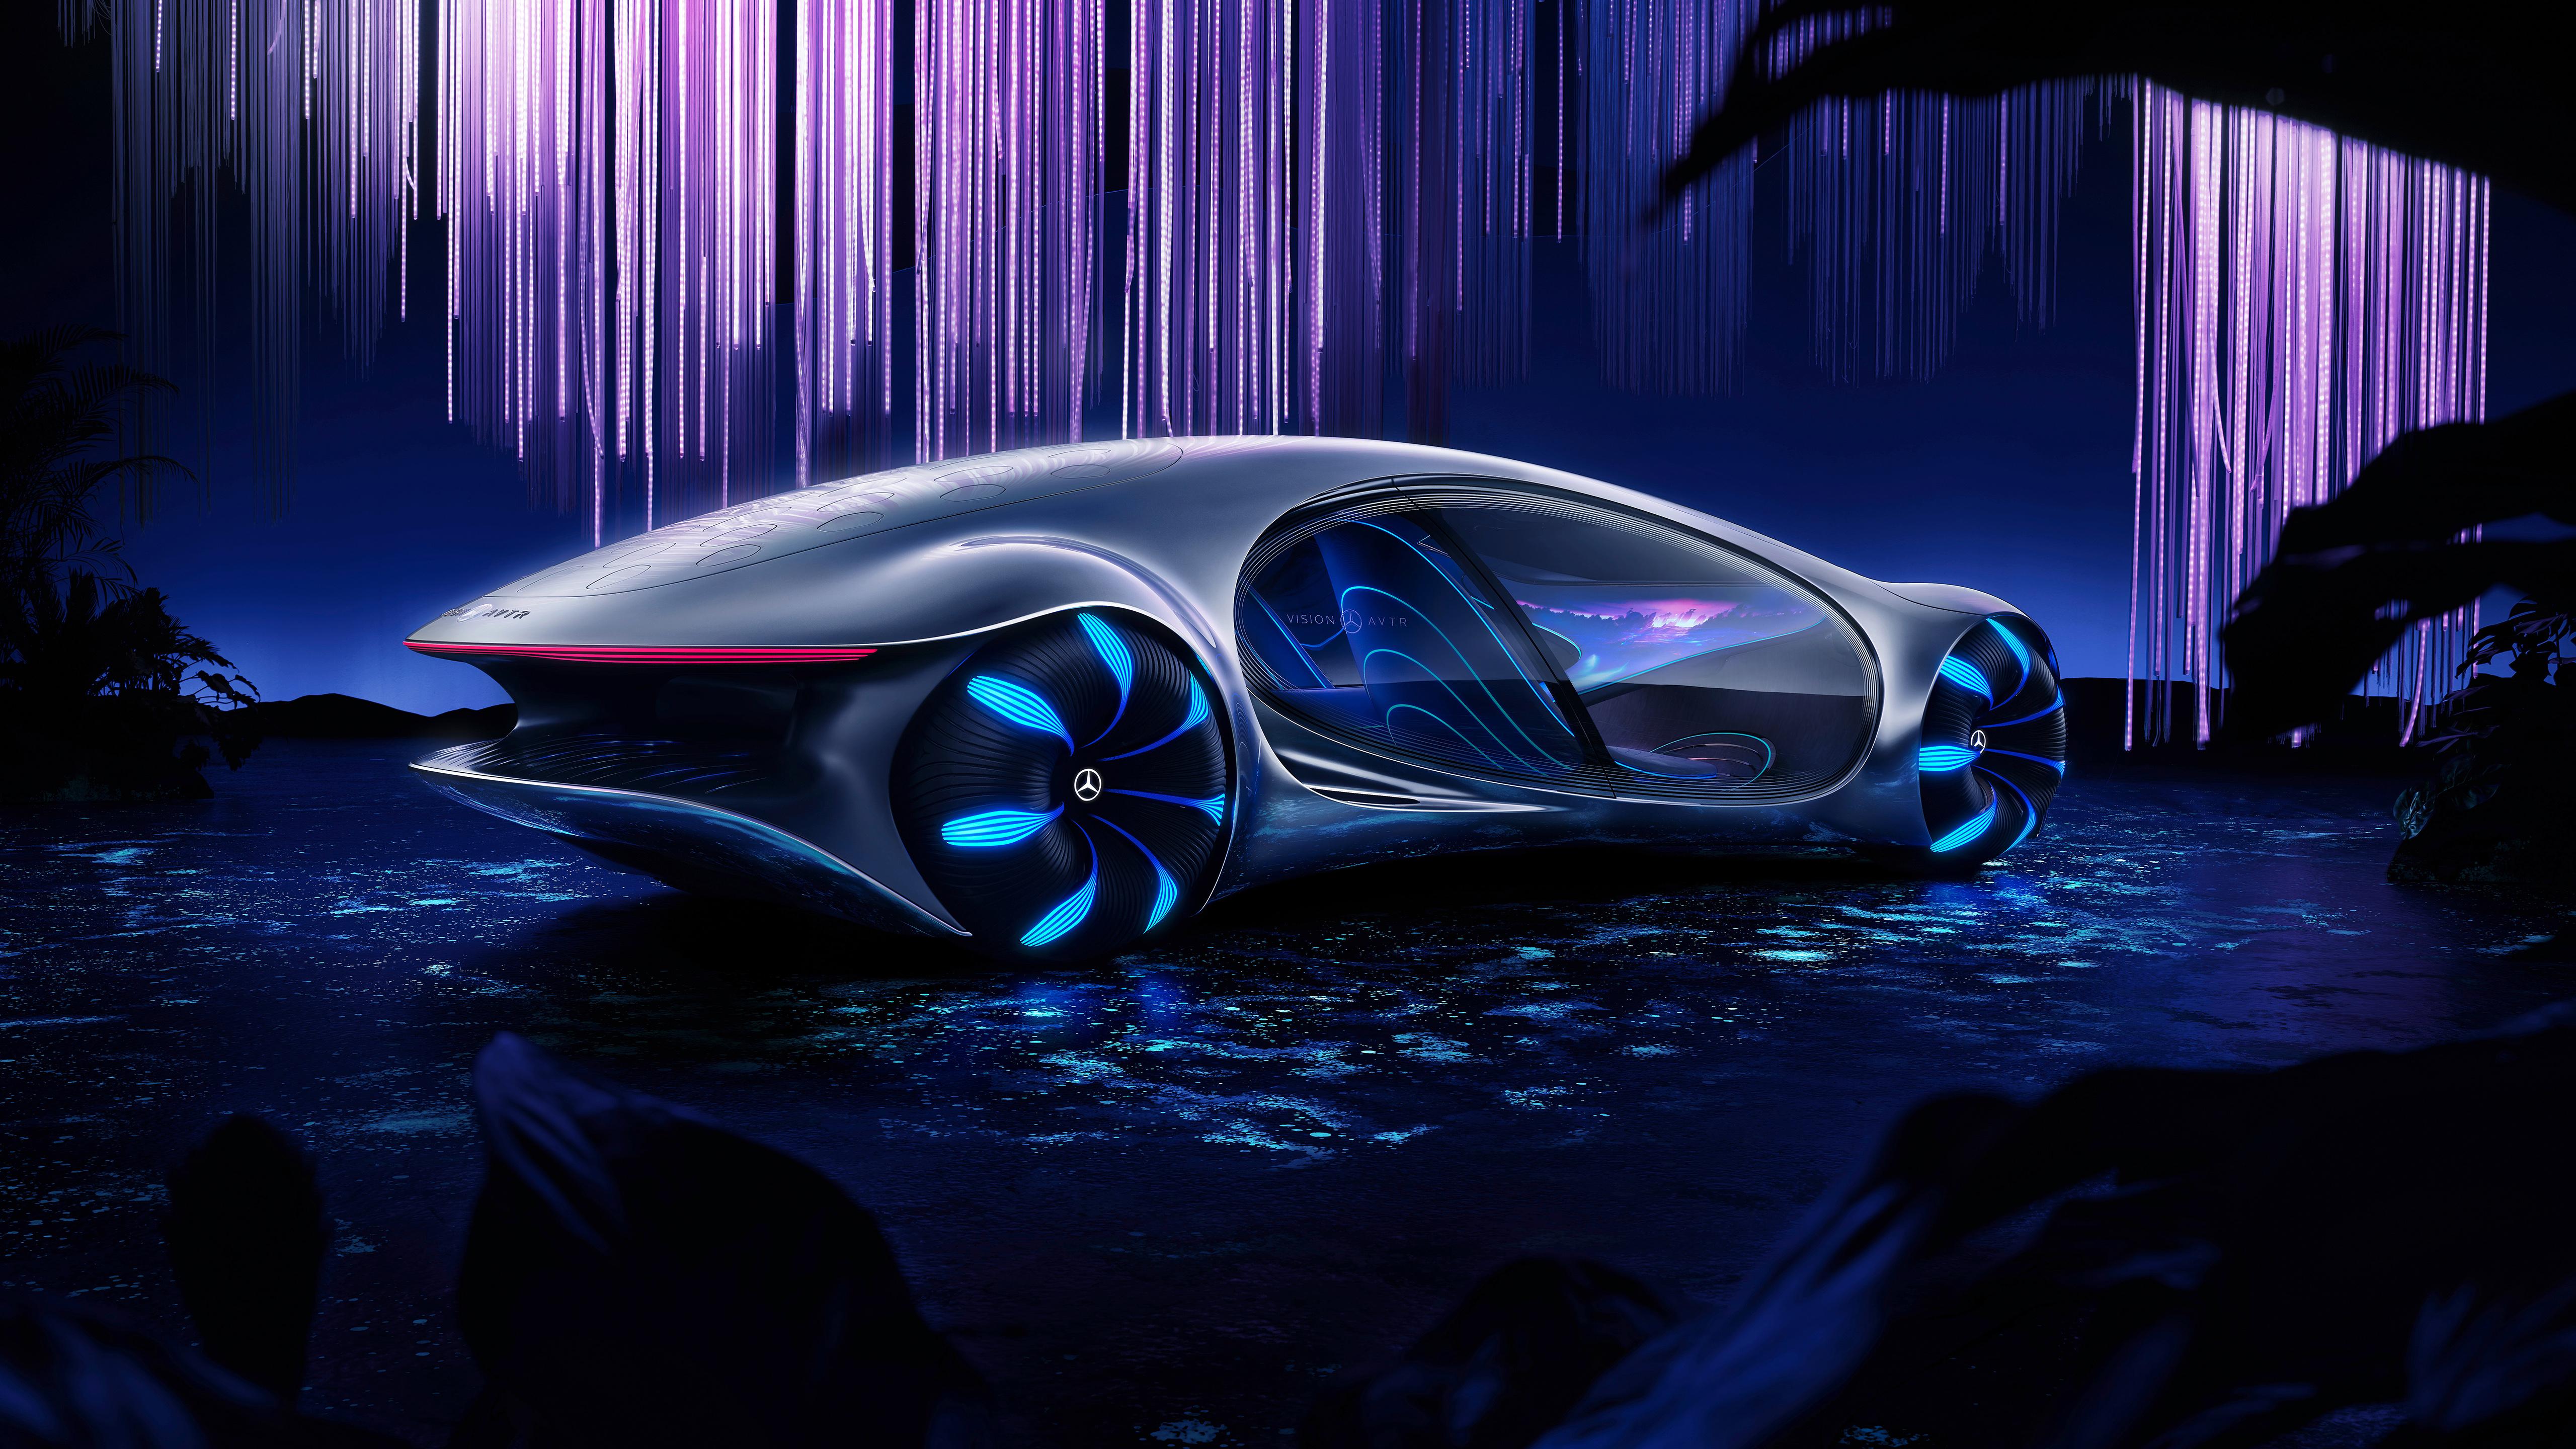 Mercedes Benz VISION AVTR 2020 5K Wallpaper HD Car Wallpapers 5120x2880